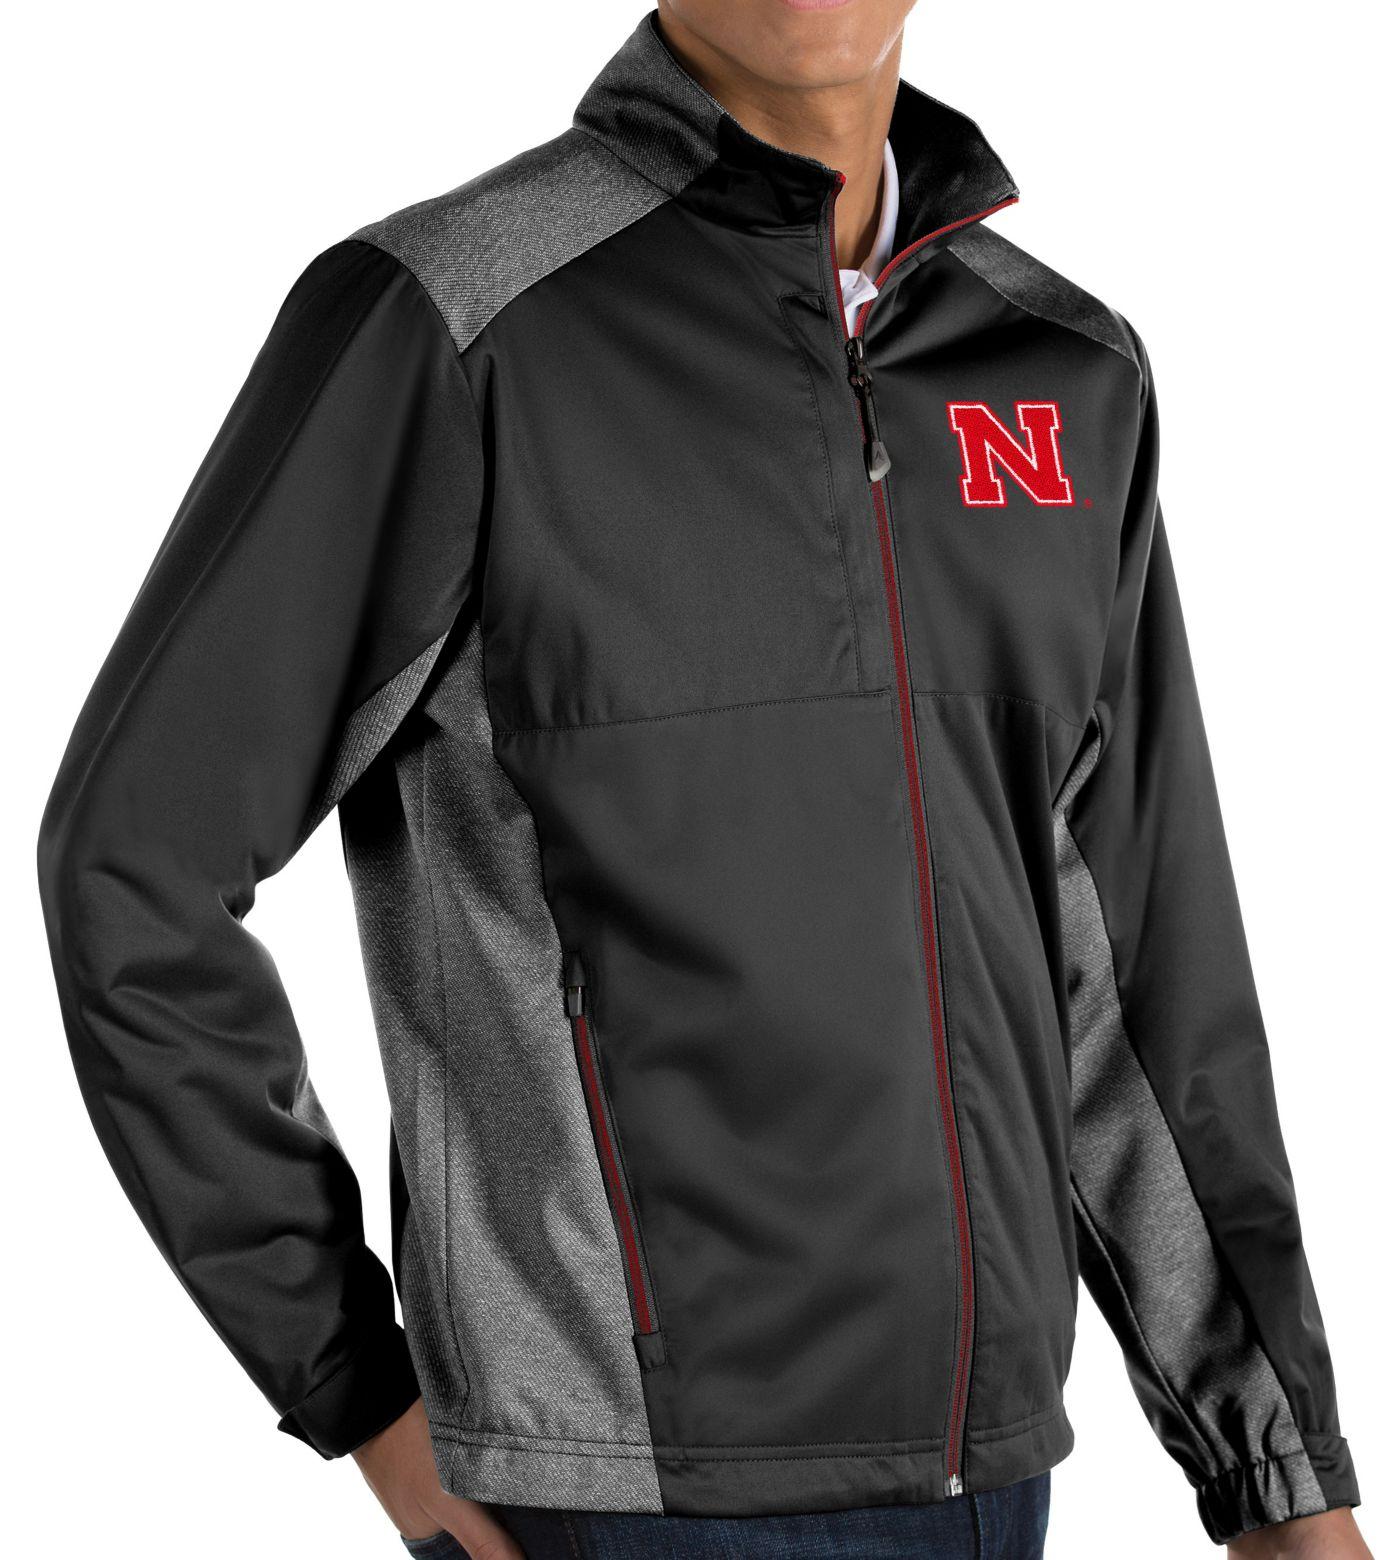 Antigua Men's Nebraska Cornhuskers Revolve Full-Zip Black Jacket